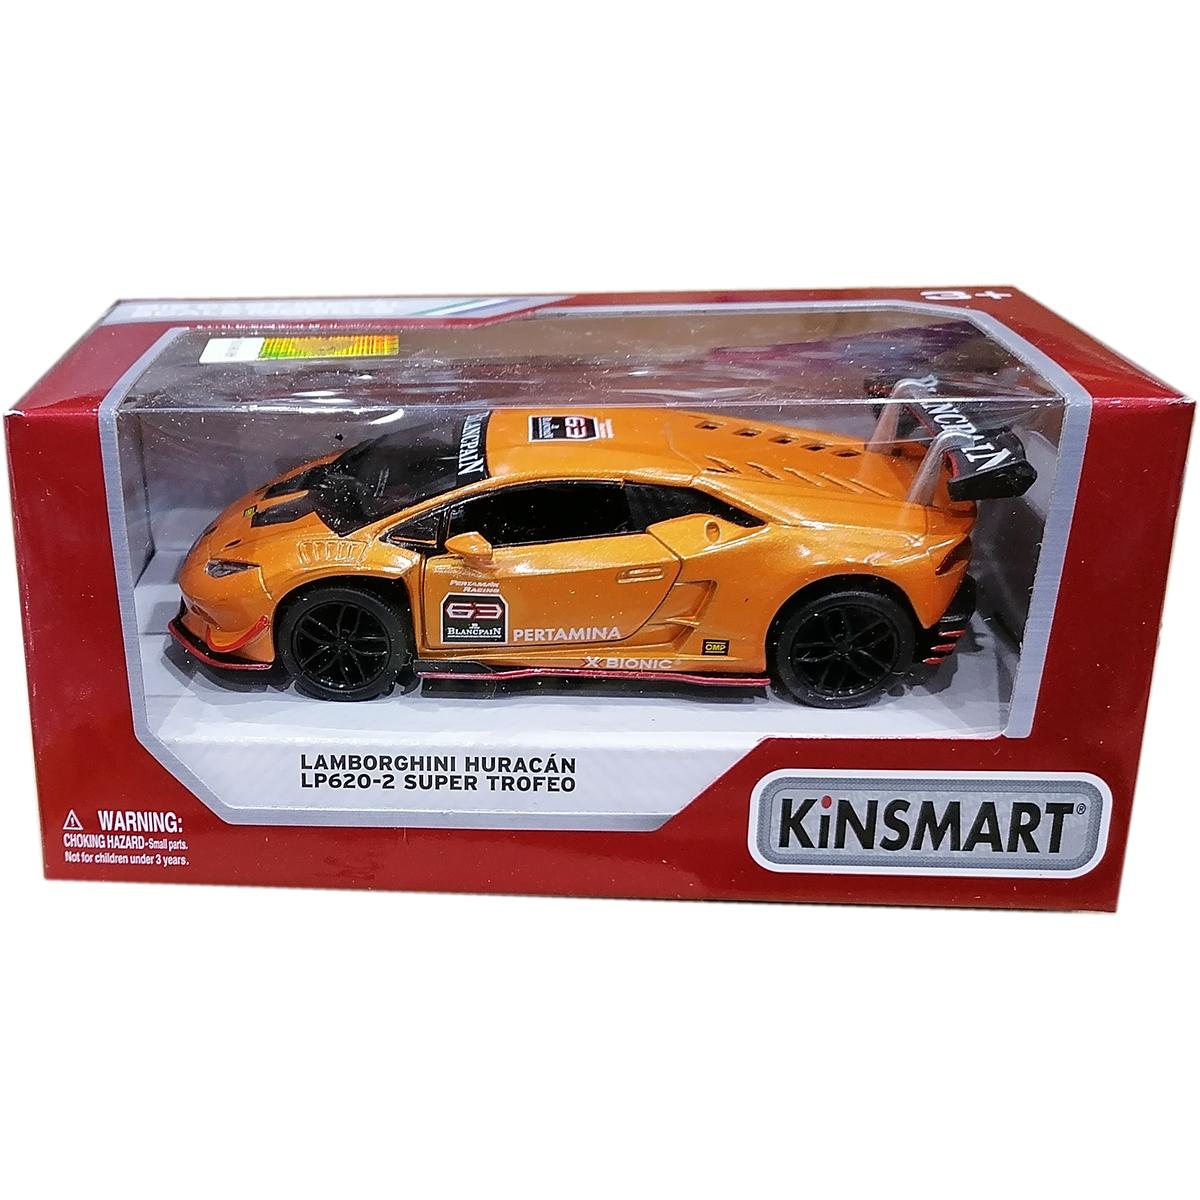 Masinuta din metal Kinsmart, Lamborghini Huracan, Portocaliu